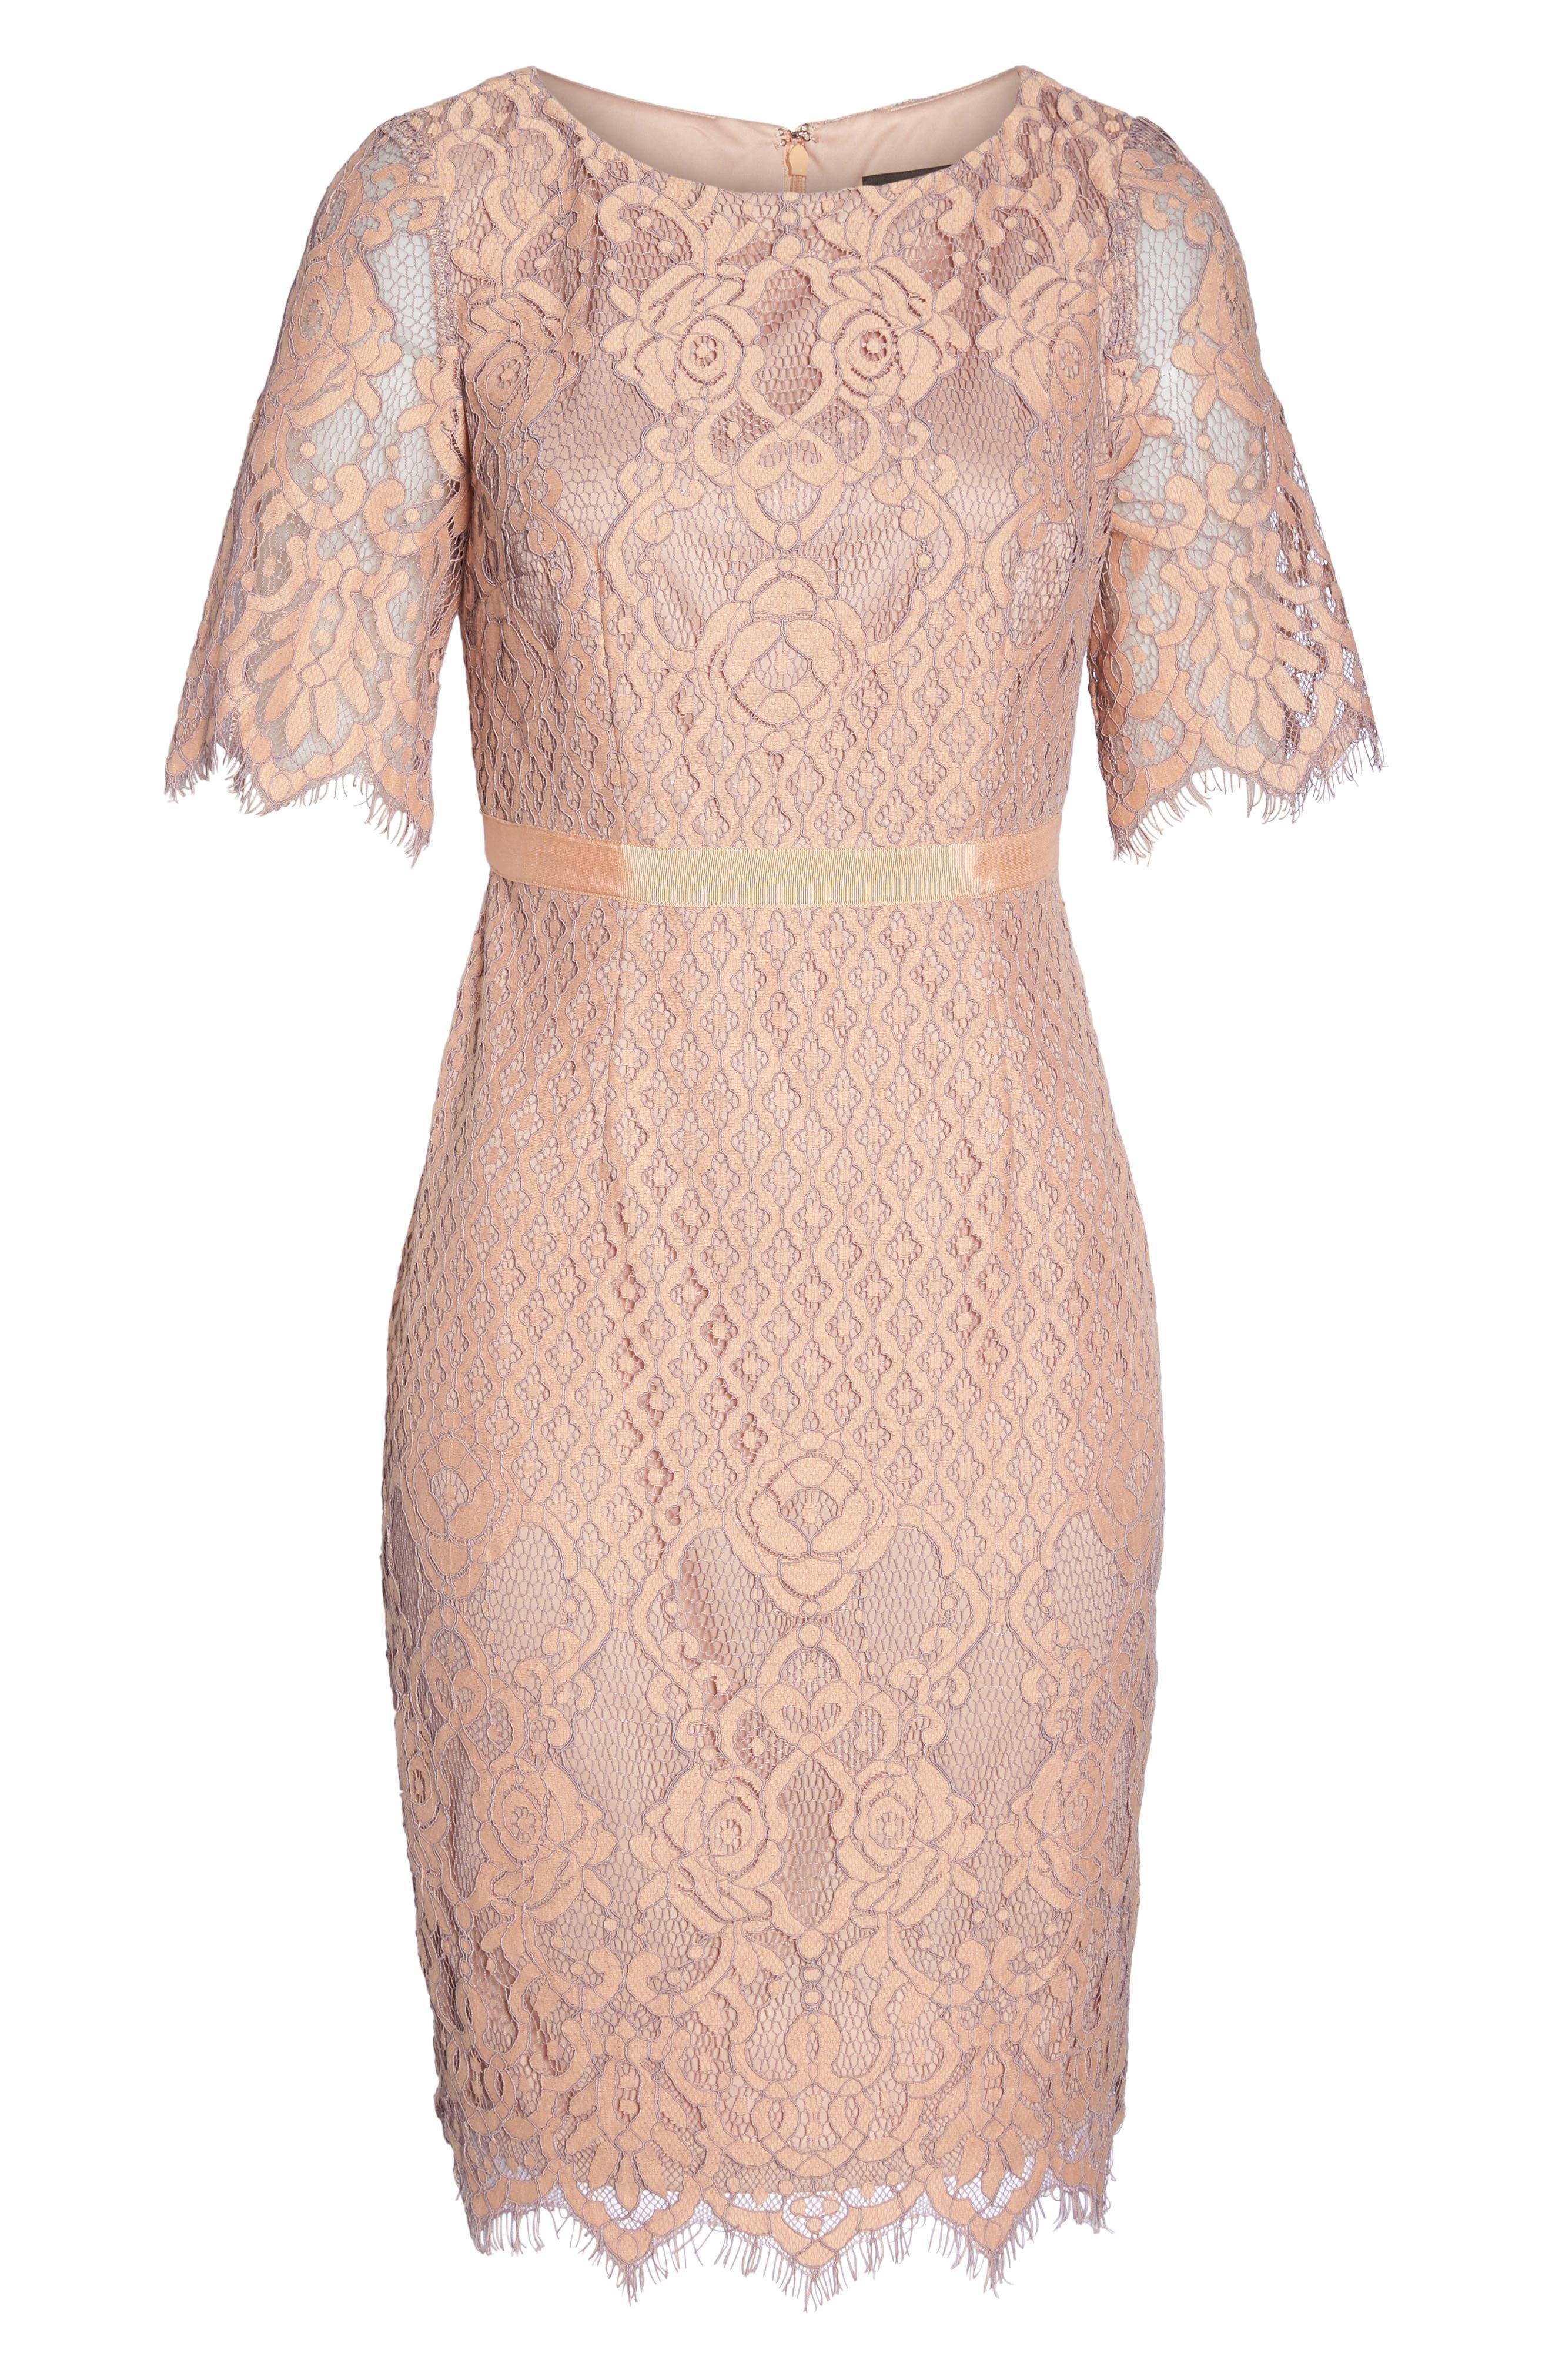 Lace Sheath Dress,                             Alternate thumbnail 6, color,                             950